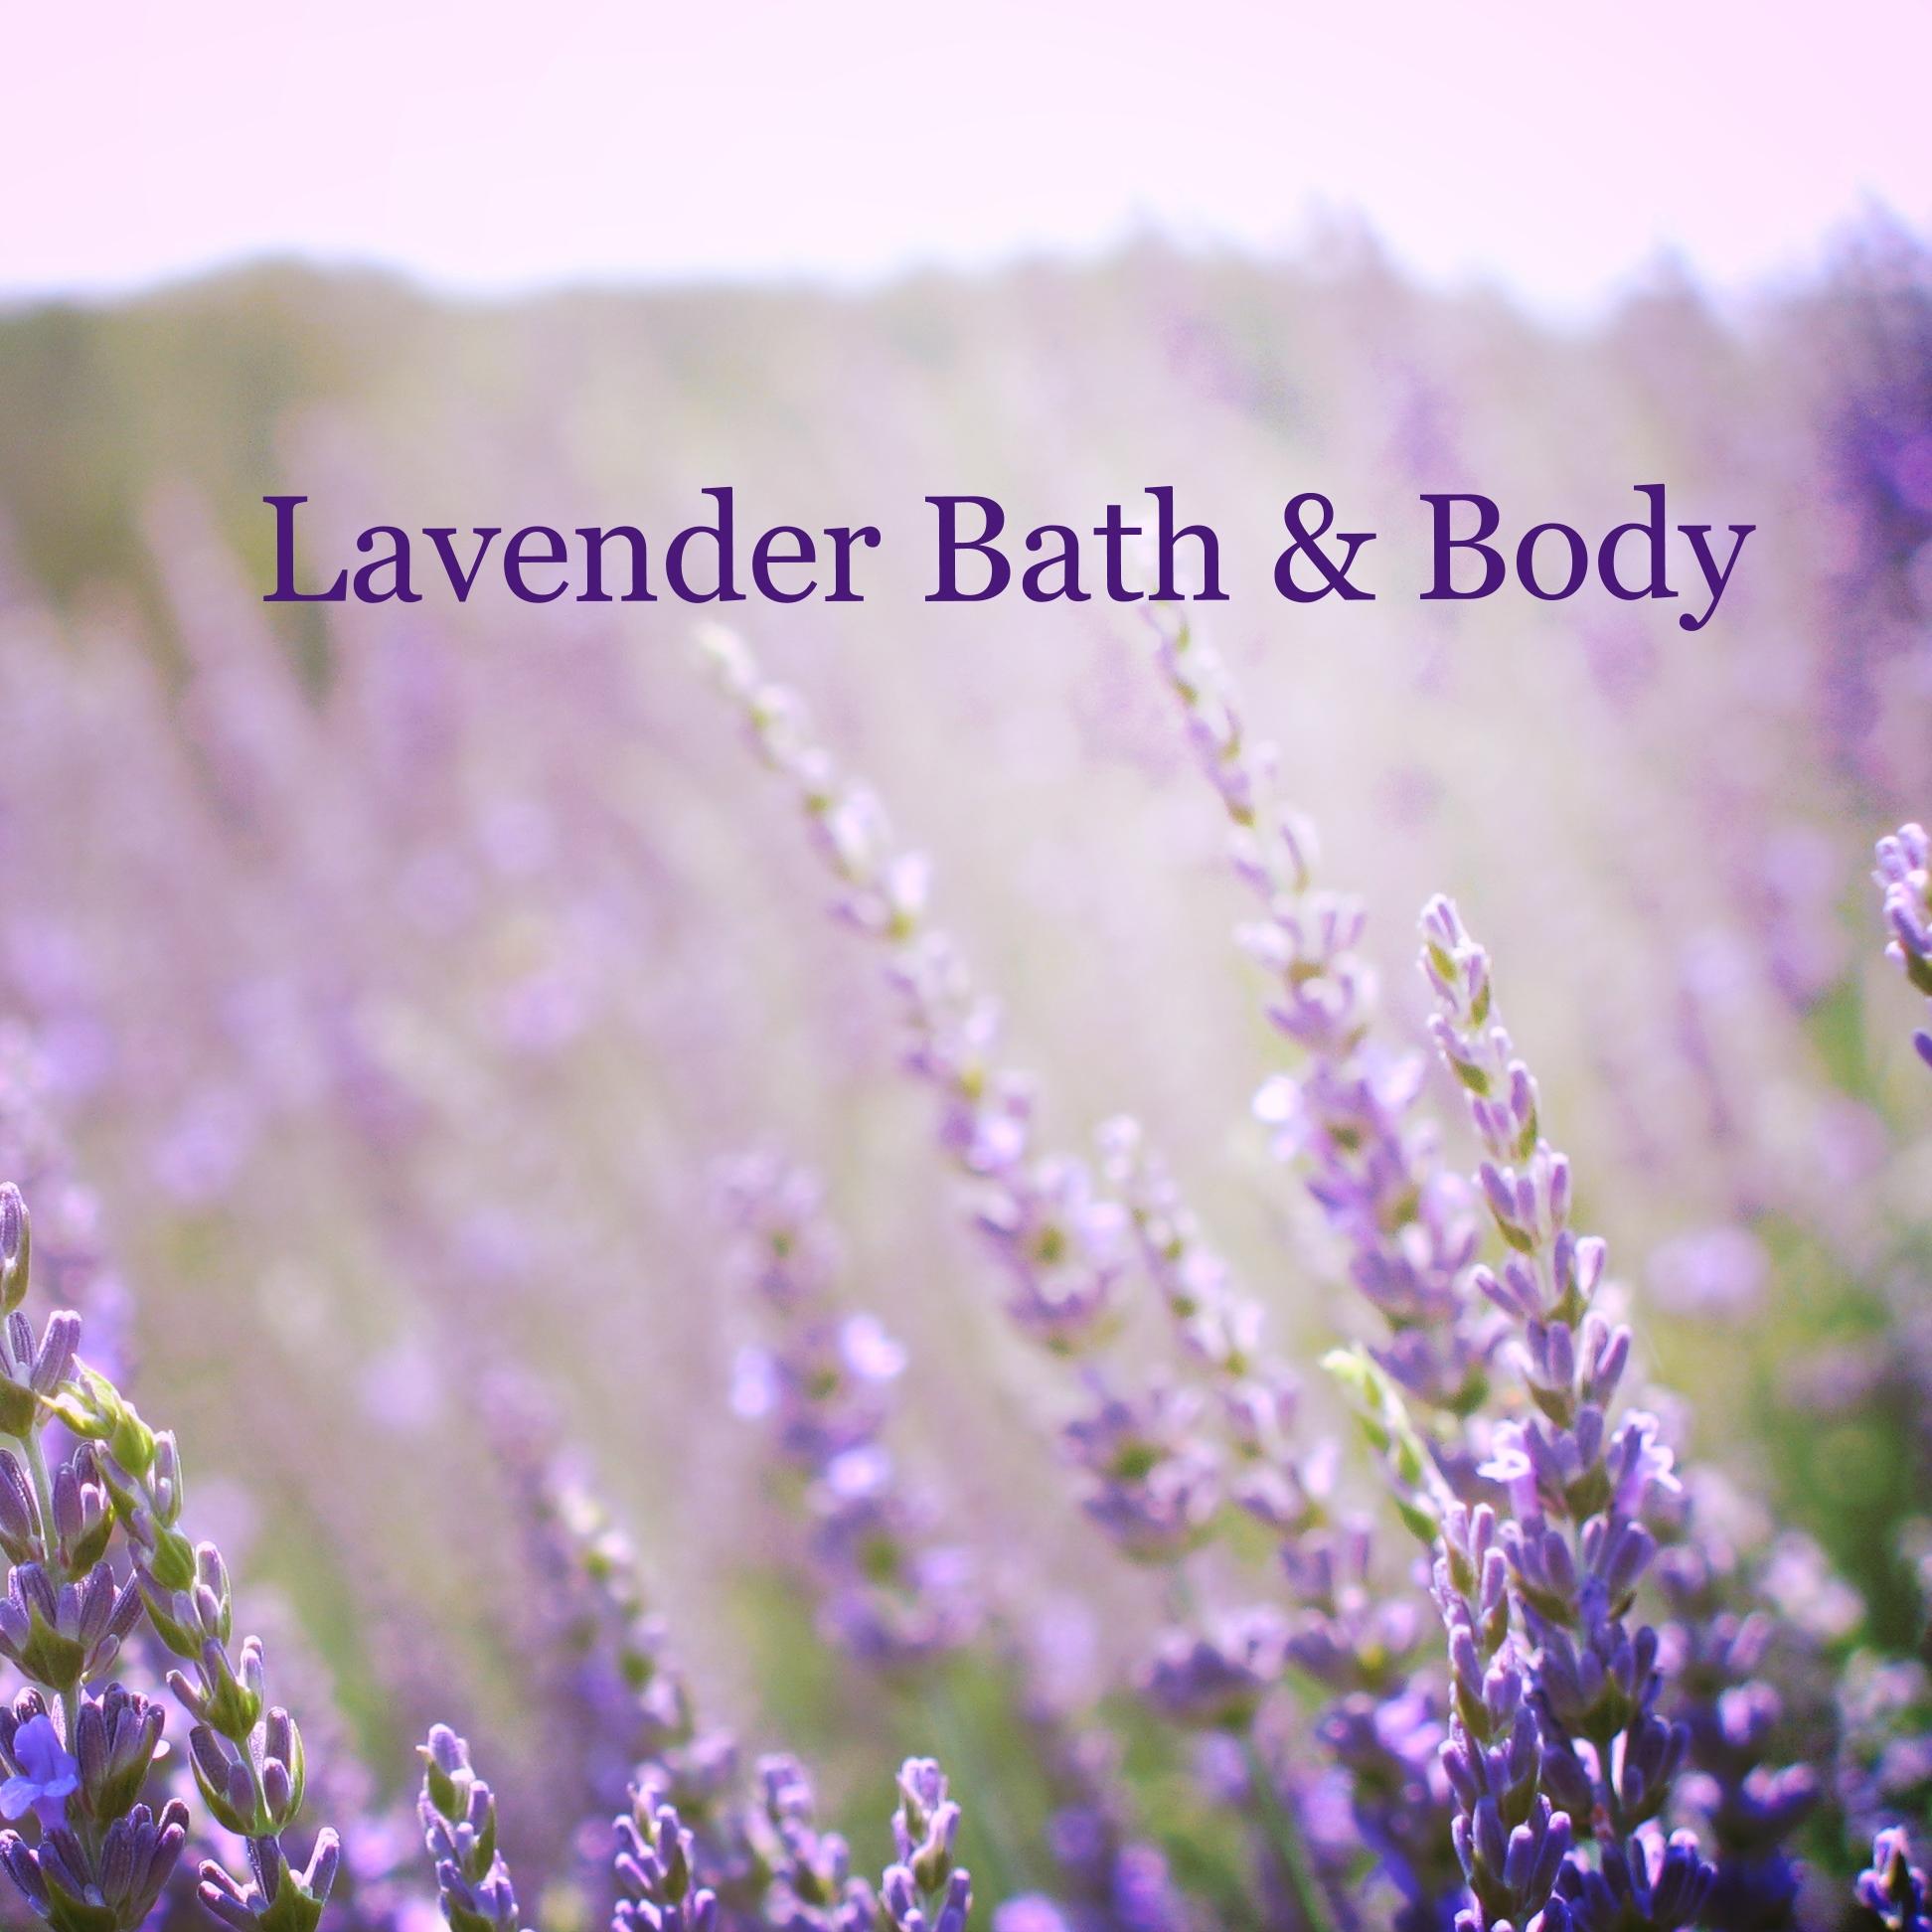 Lavender Bath & Body